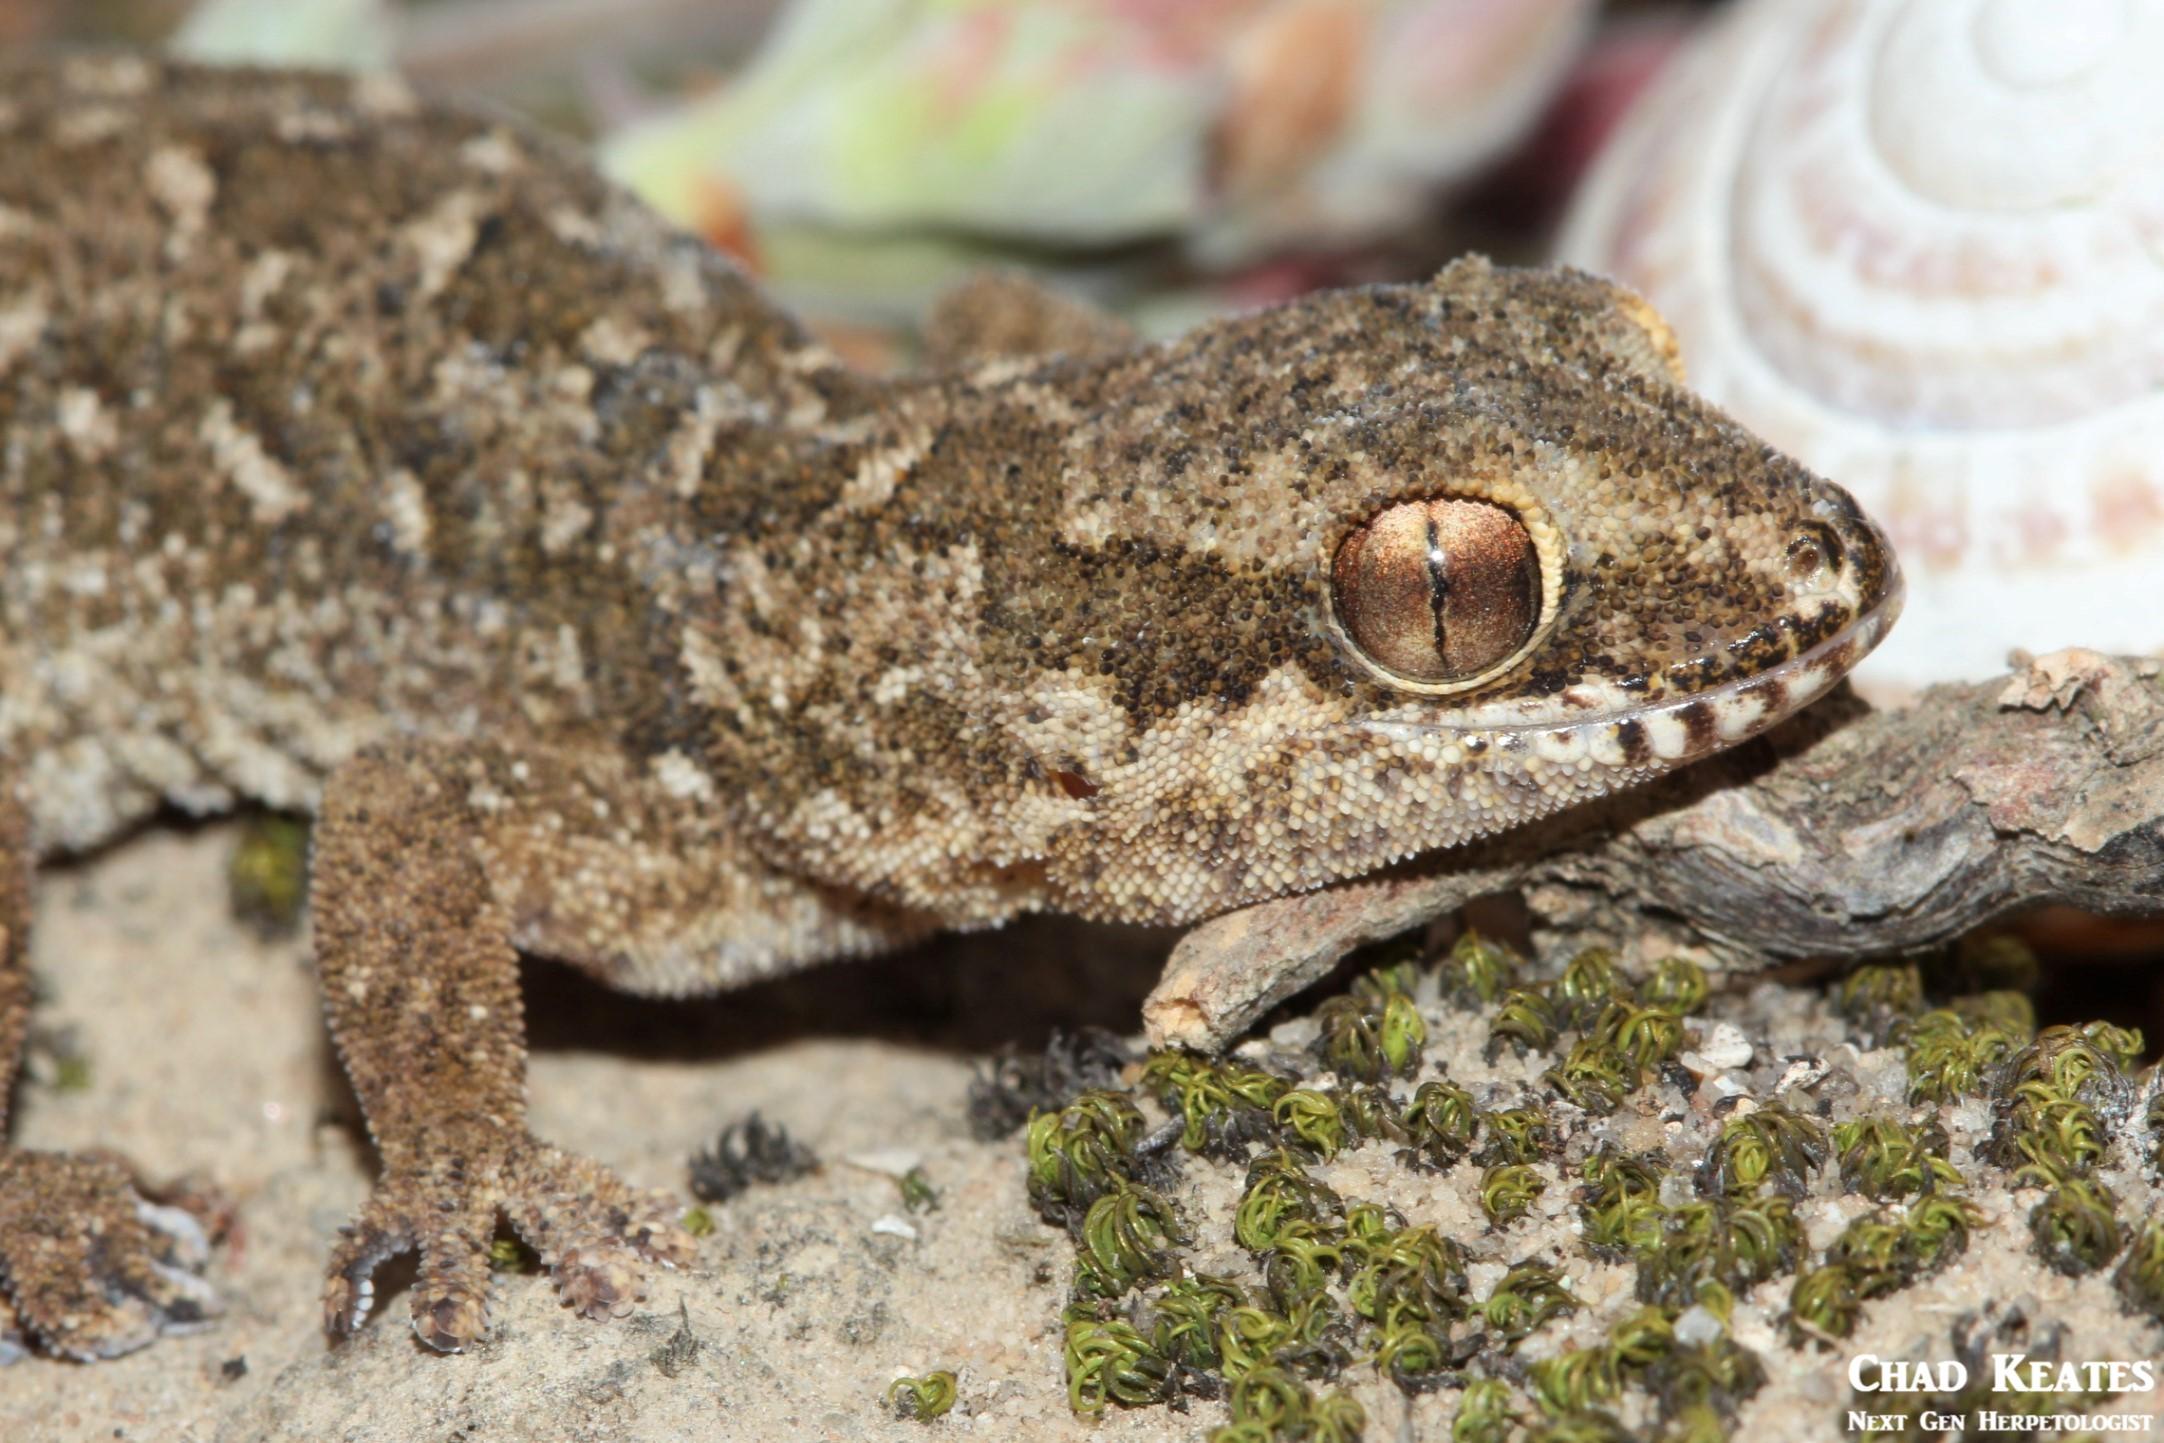 Pachydactylus_maculatus_Spotted_Gecko_Chad_Keates (6)